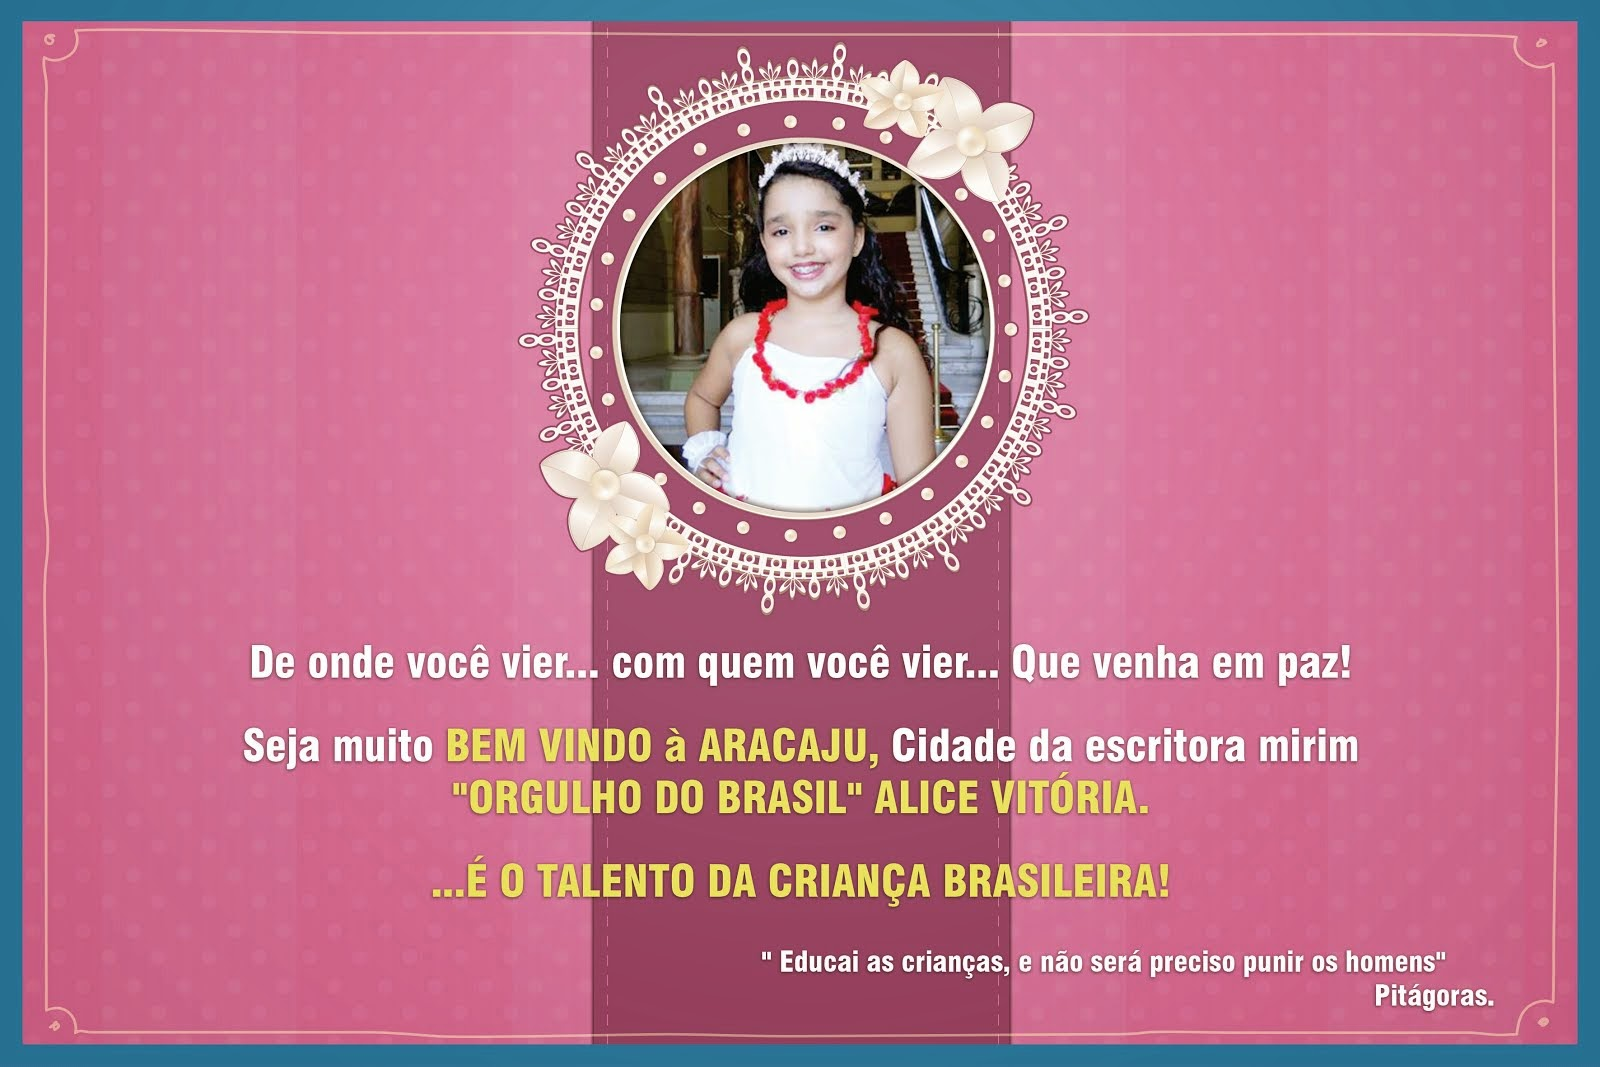 Aracaju, cidade  onde vive Alice Vitória